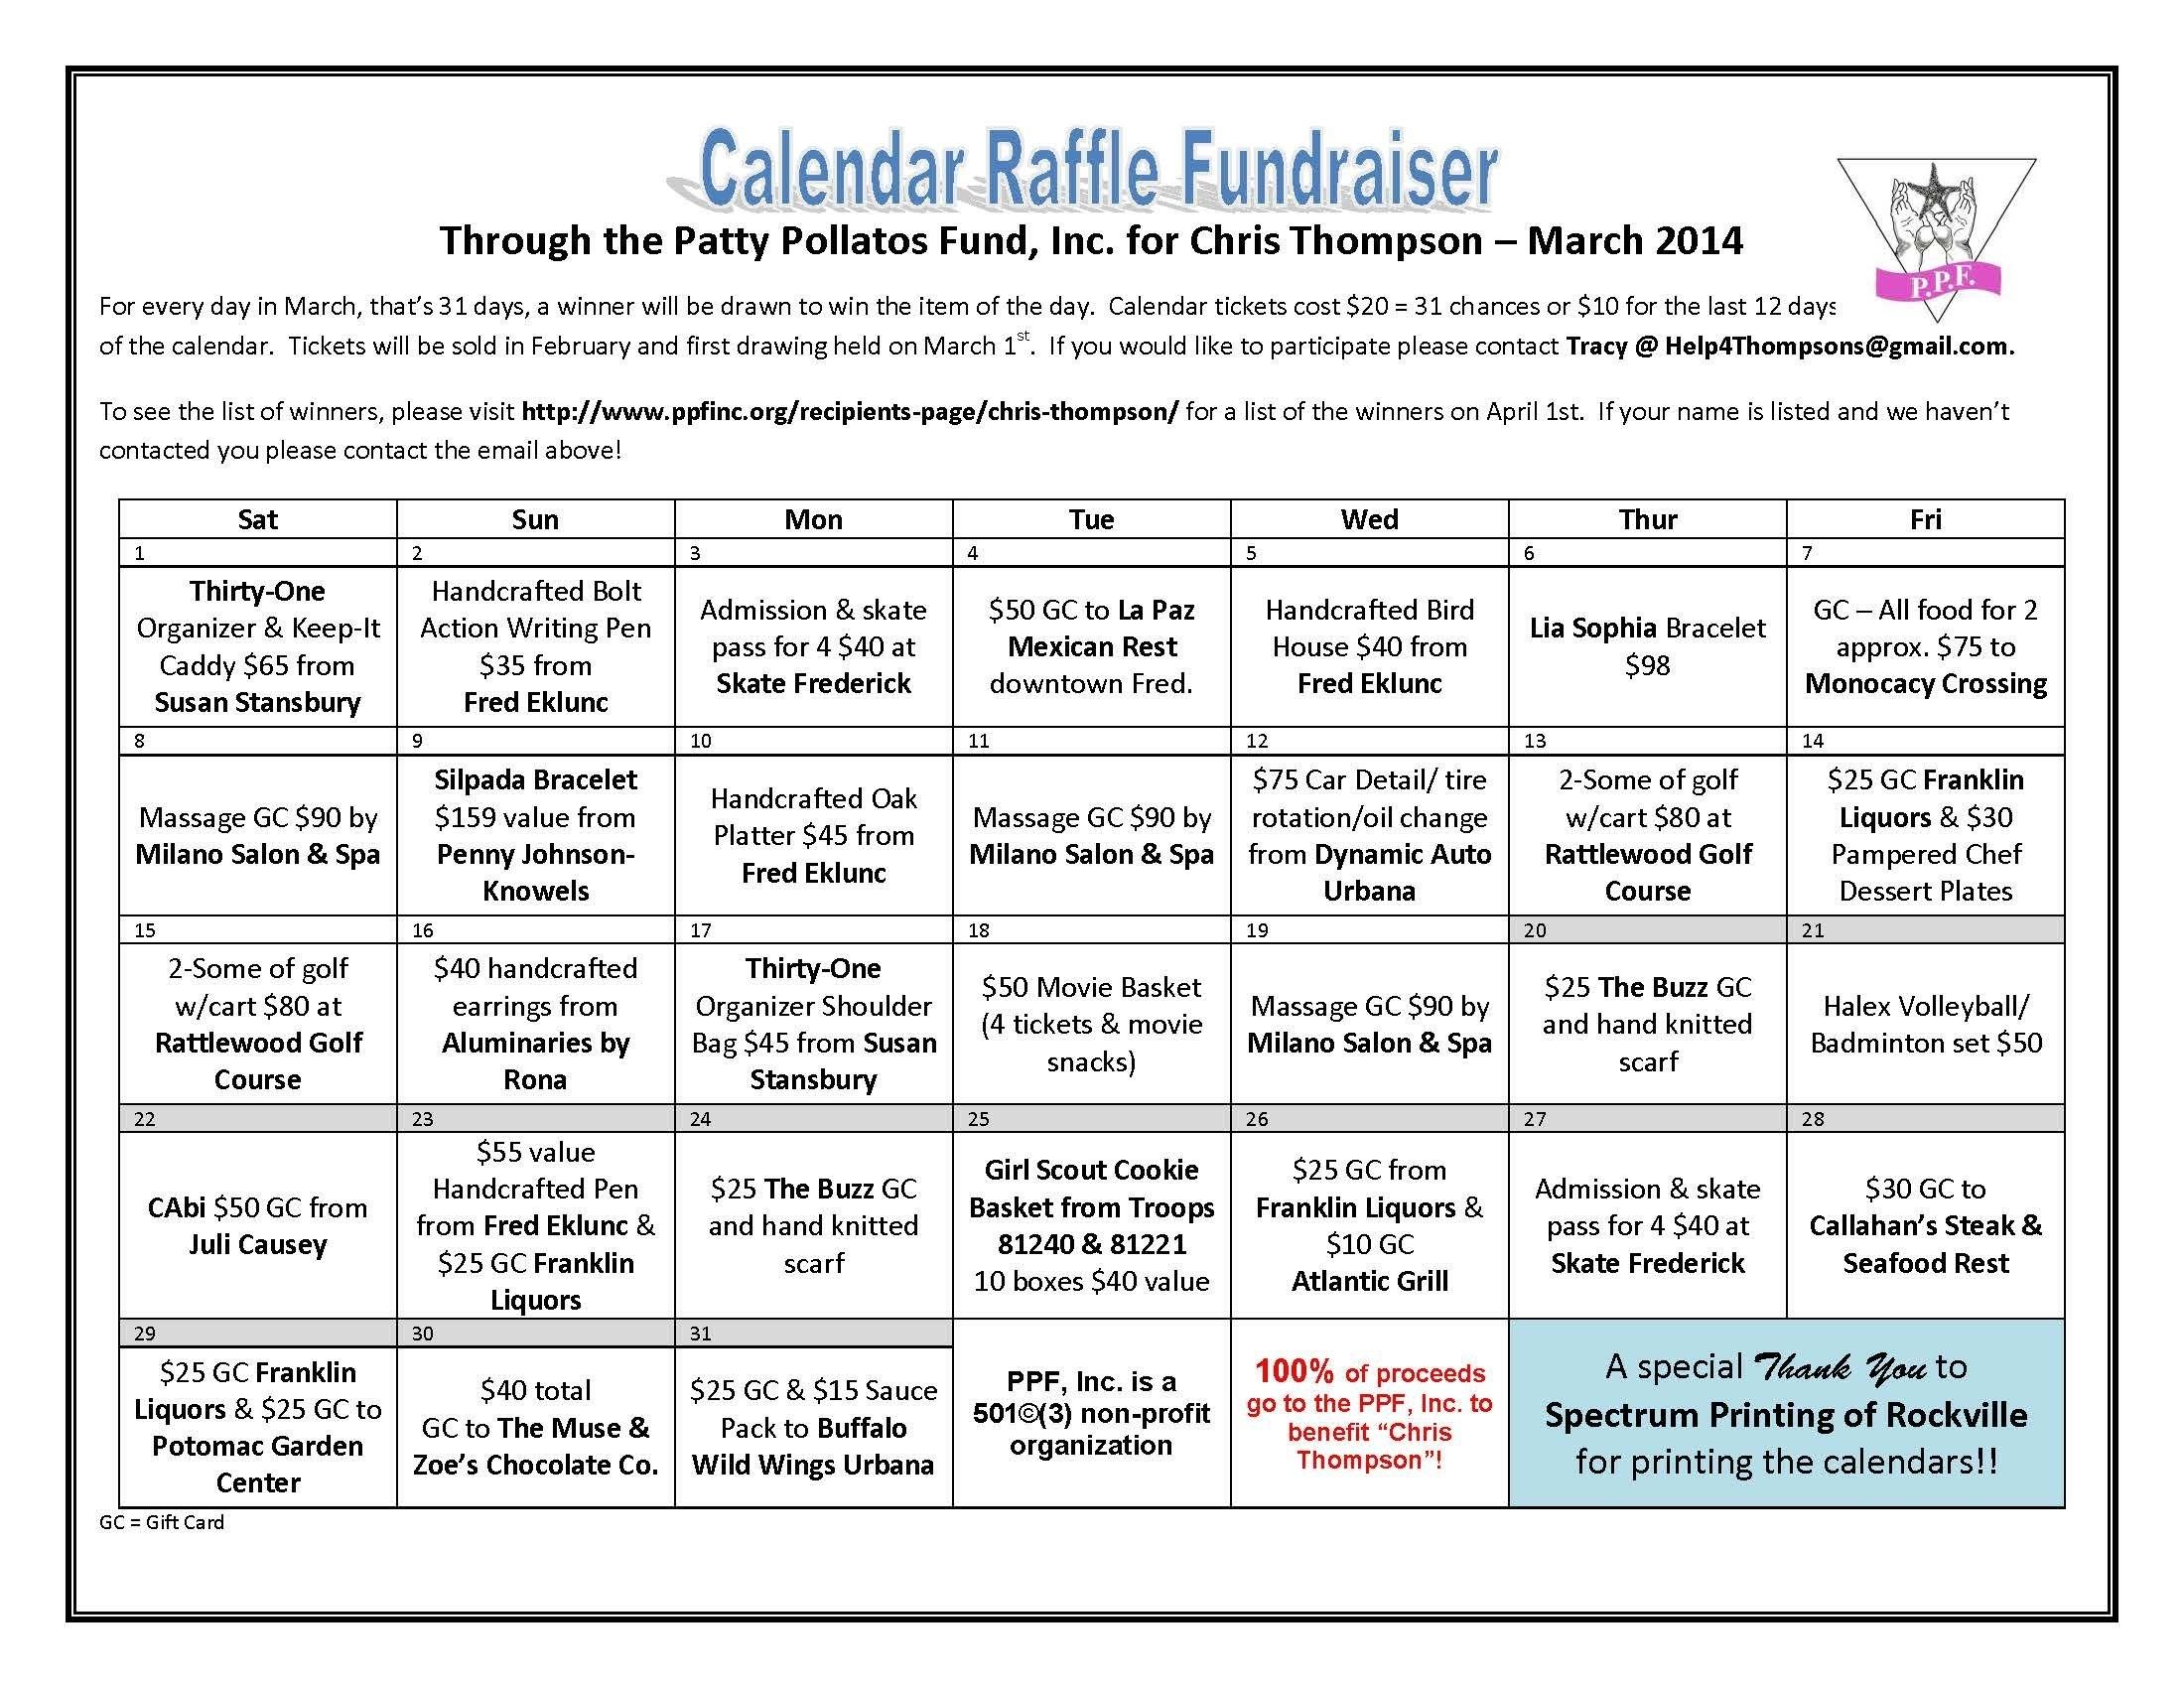 Chris Thompson Calendar Raffle - Patty Pollatos Fund